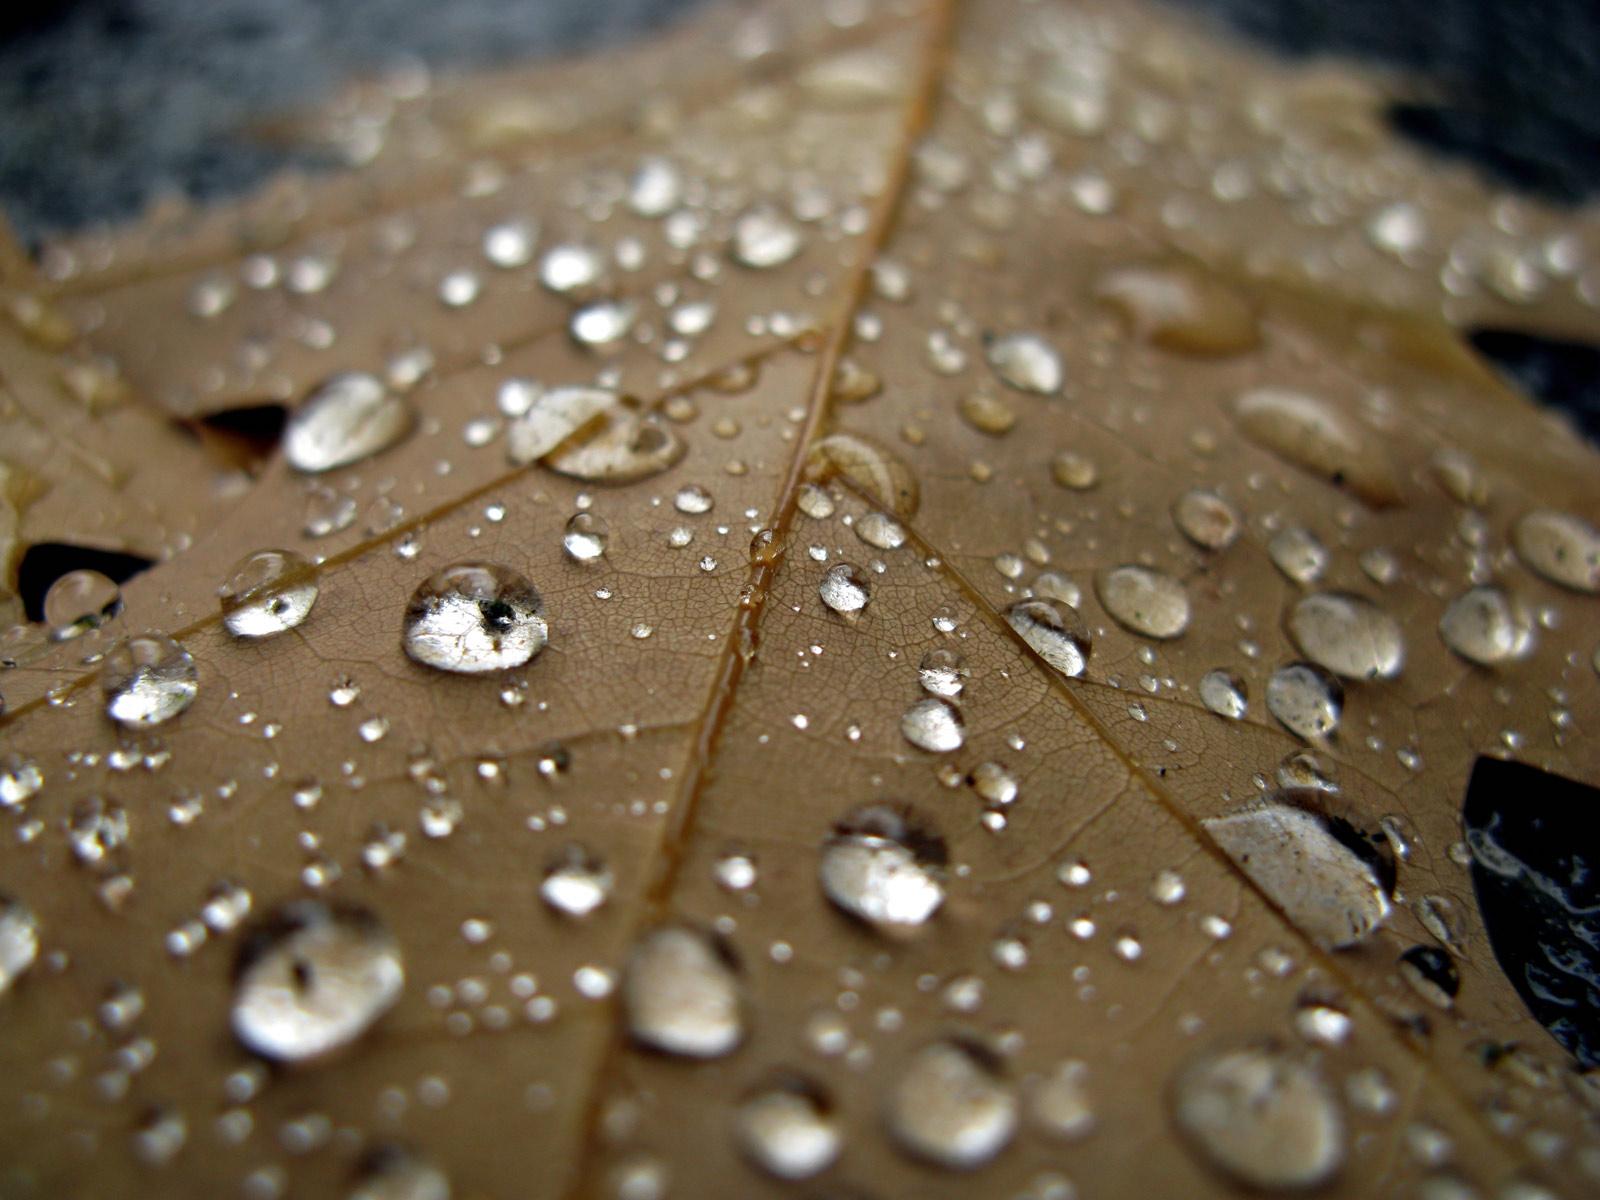 rain dew drops hd